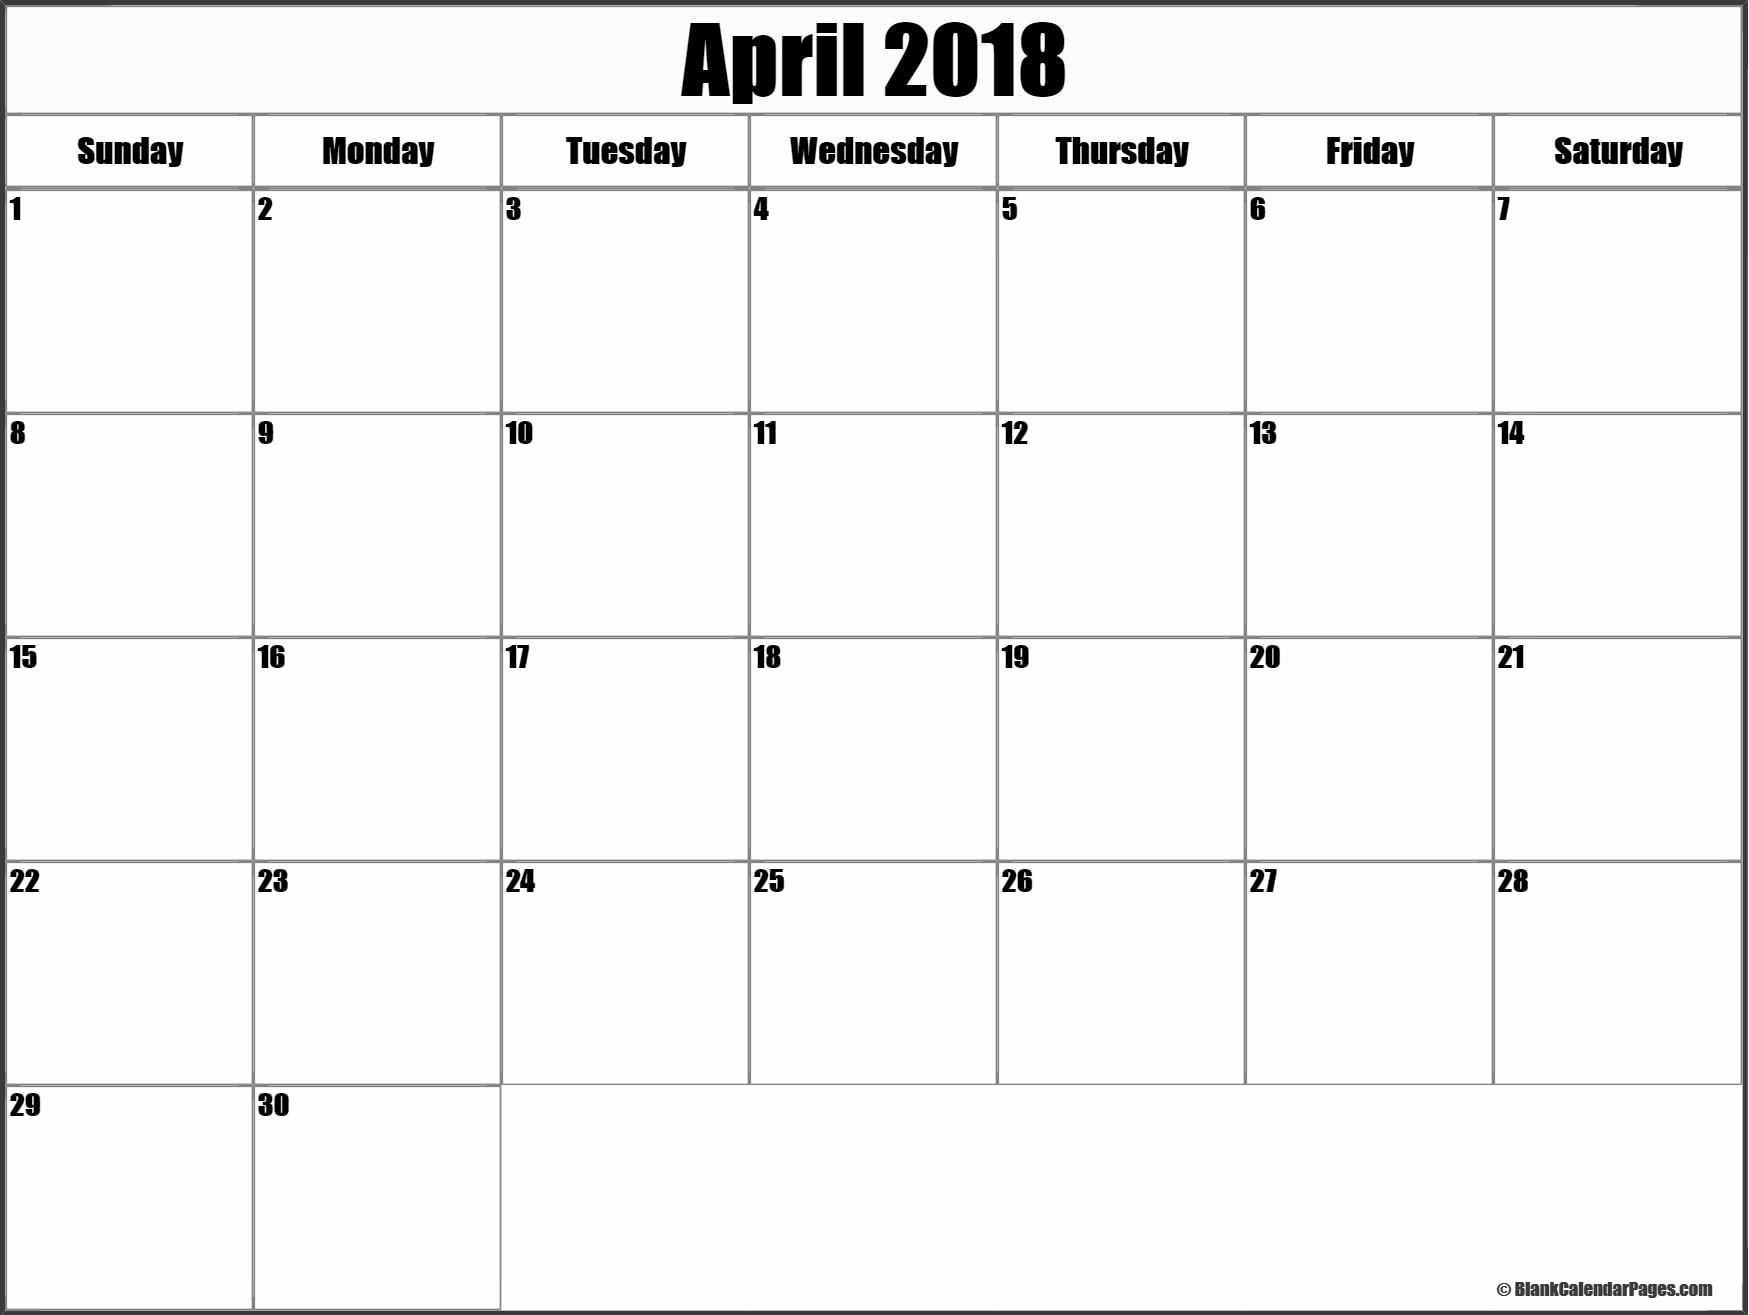 Blank April 2018 Calendar Template Luxury April 2018 Blank Calendar Templates